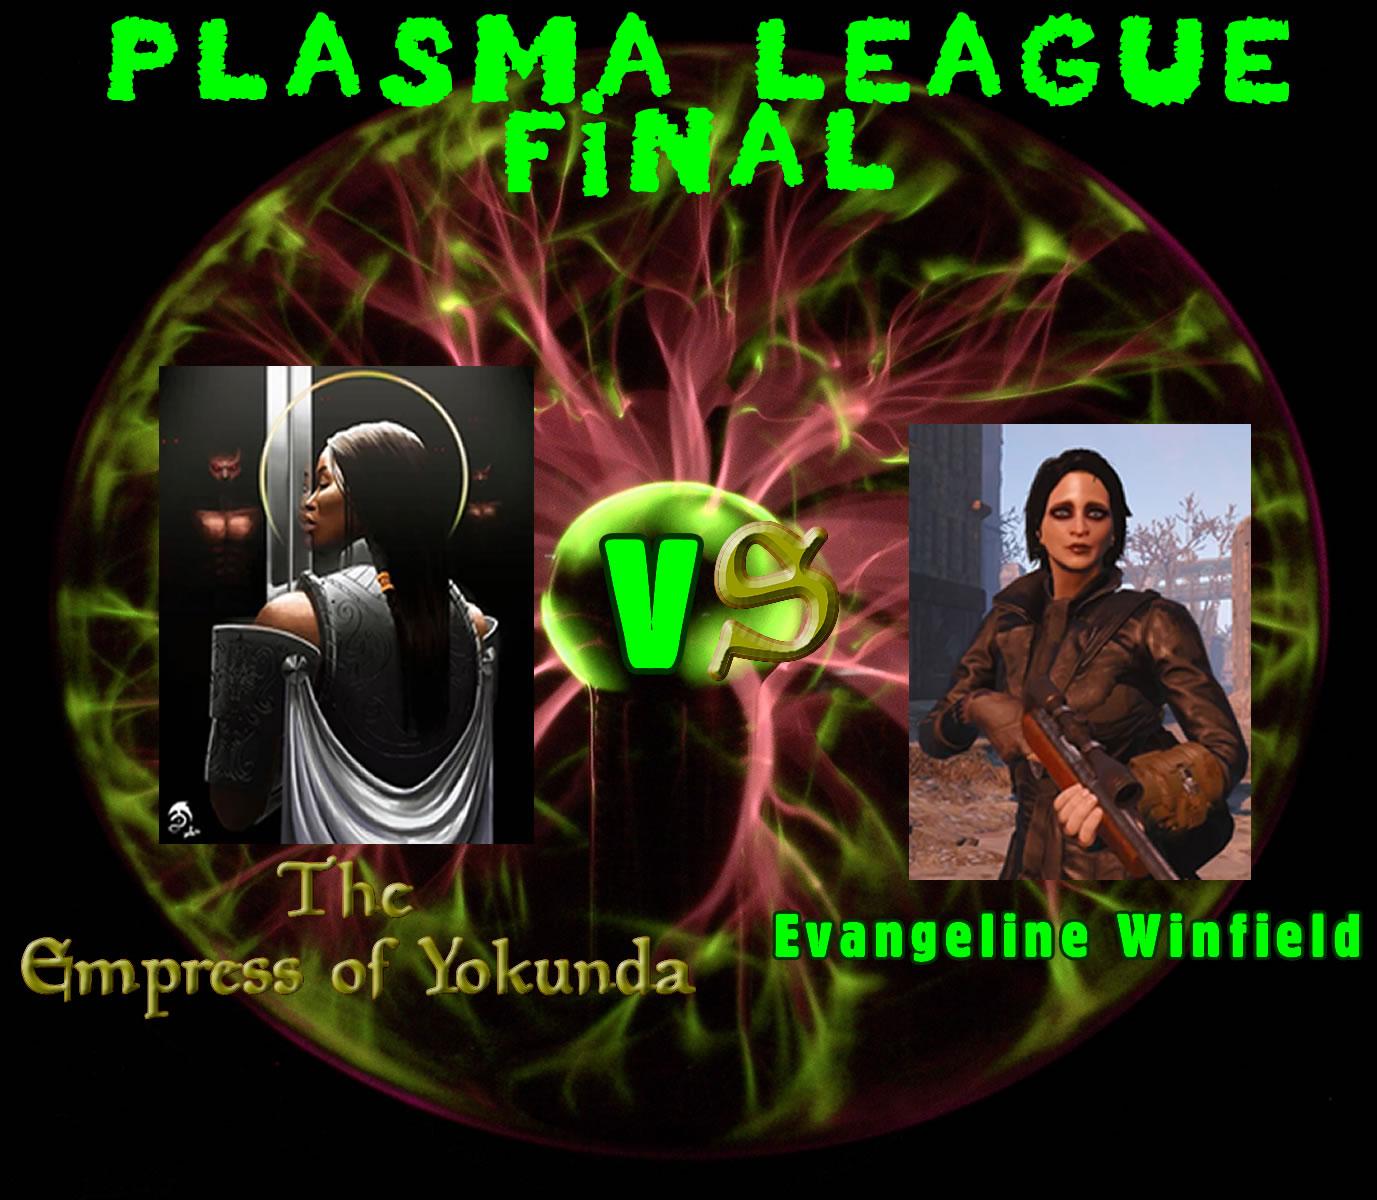 Gay 2019i Plasma league 3